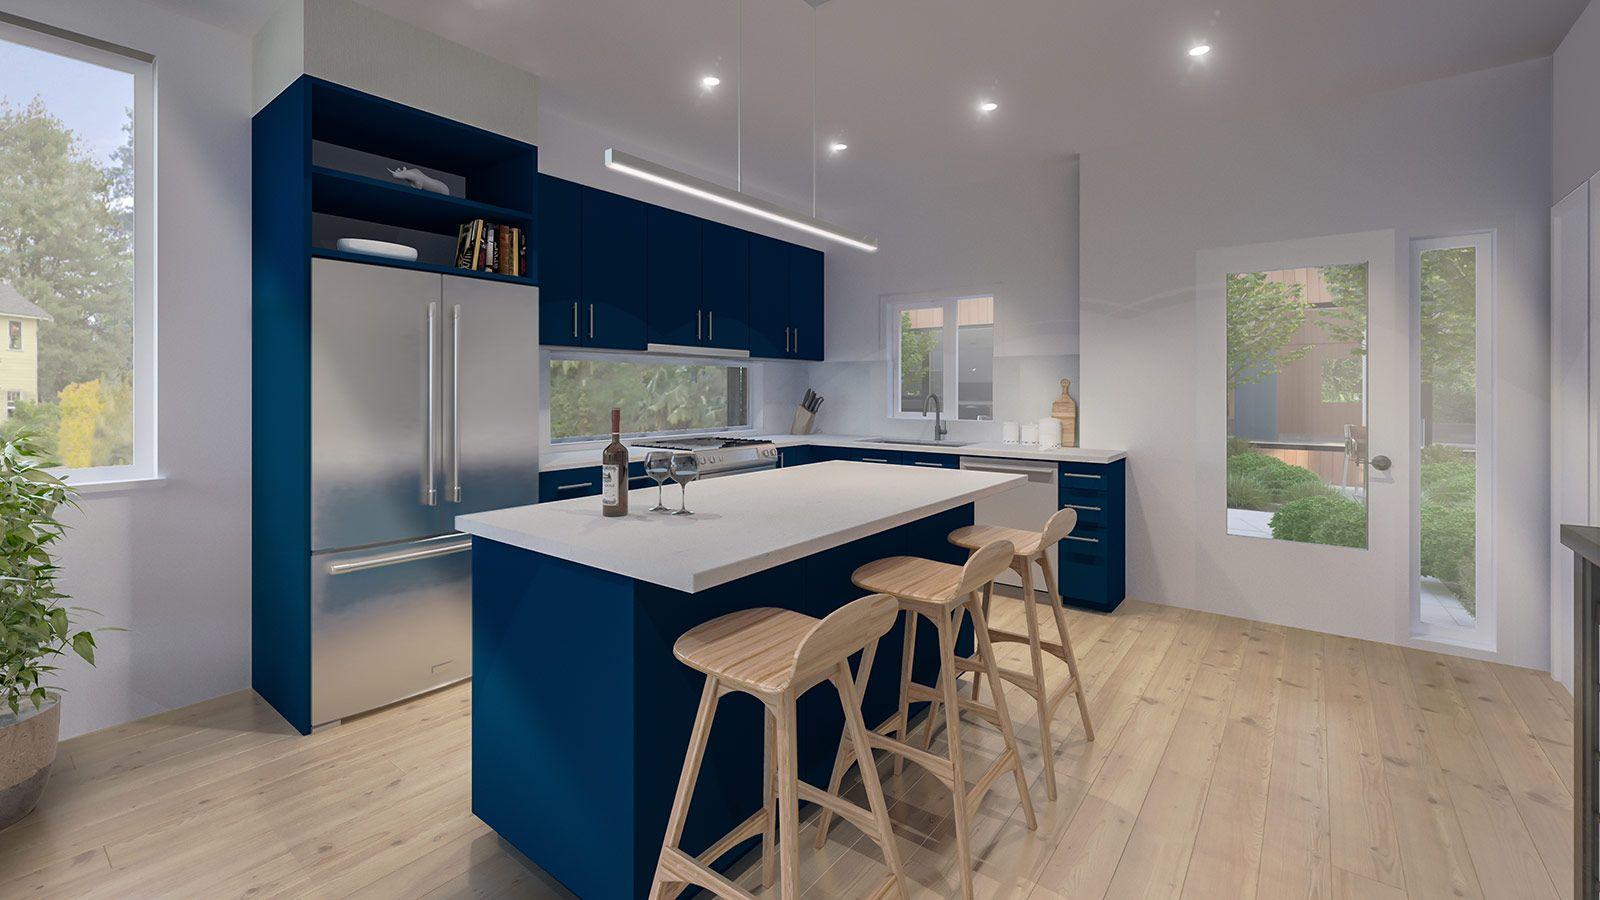 Kitchen featured in the Plan B3 By StoryBuilt in Seattle-Bellevue, WA